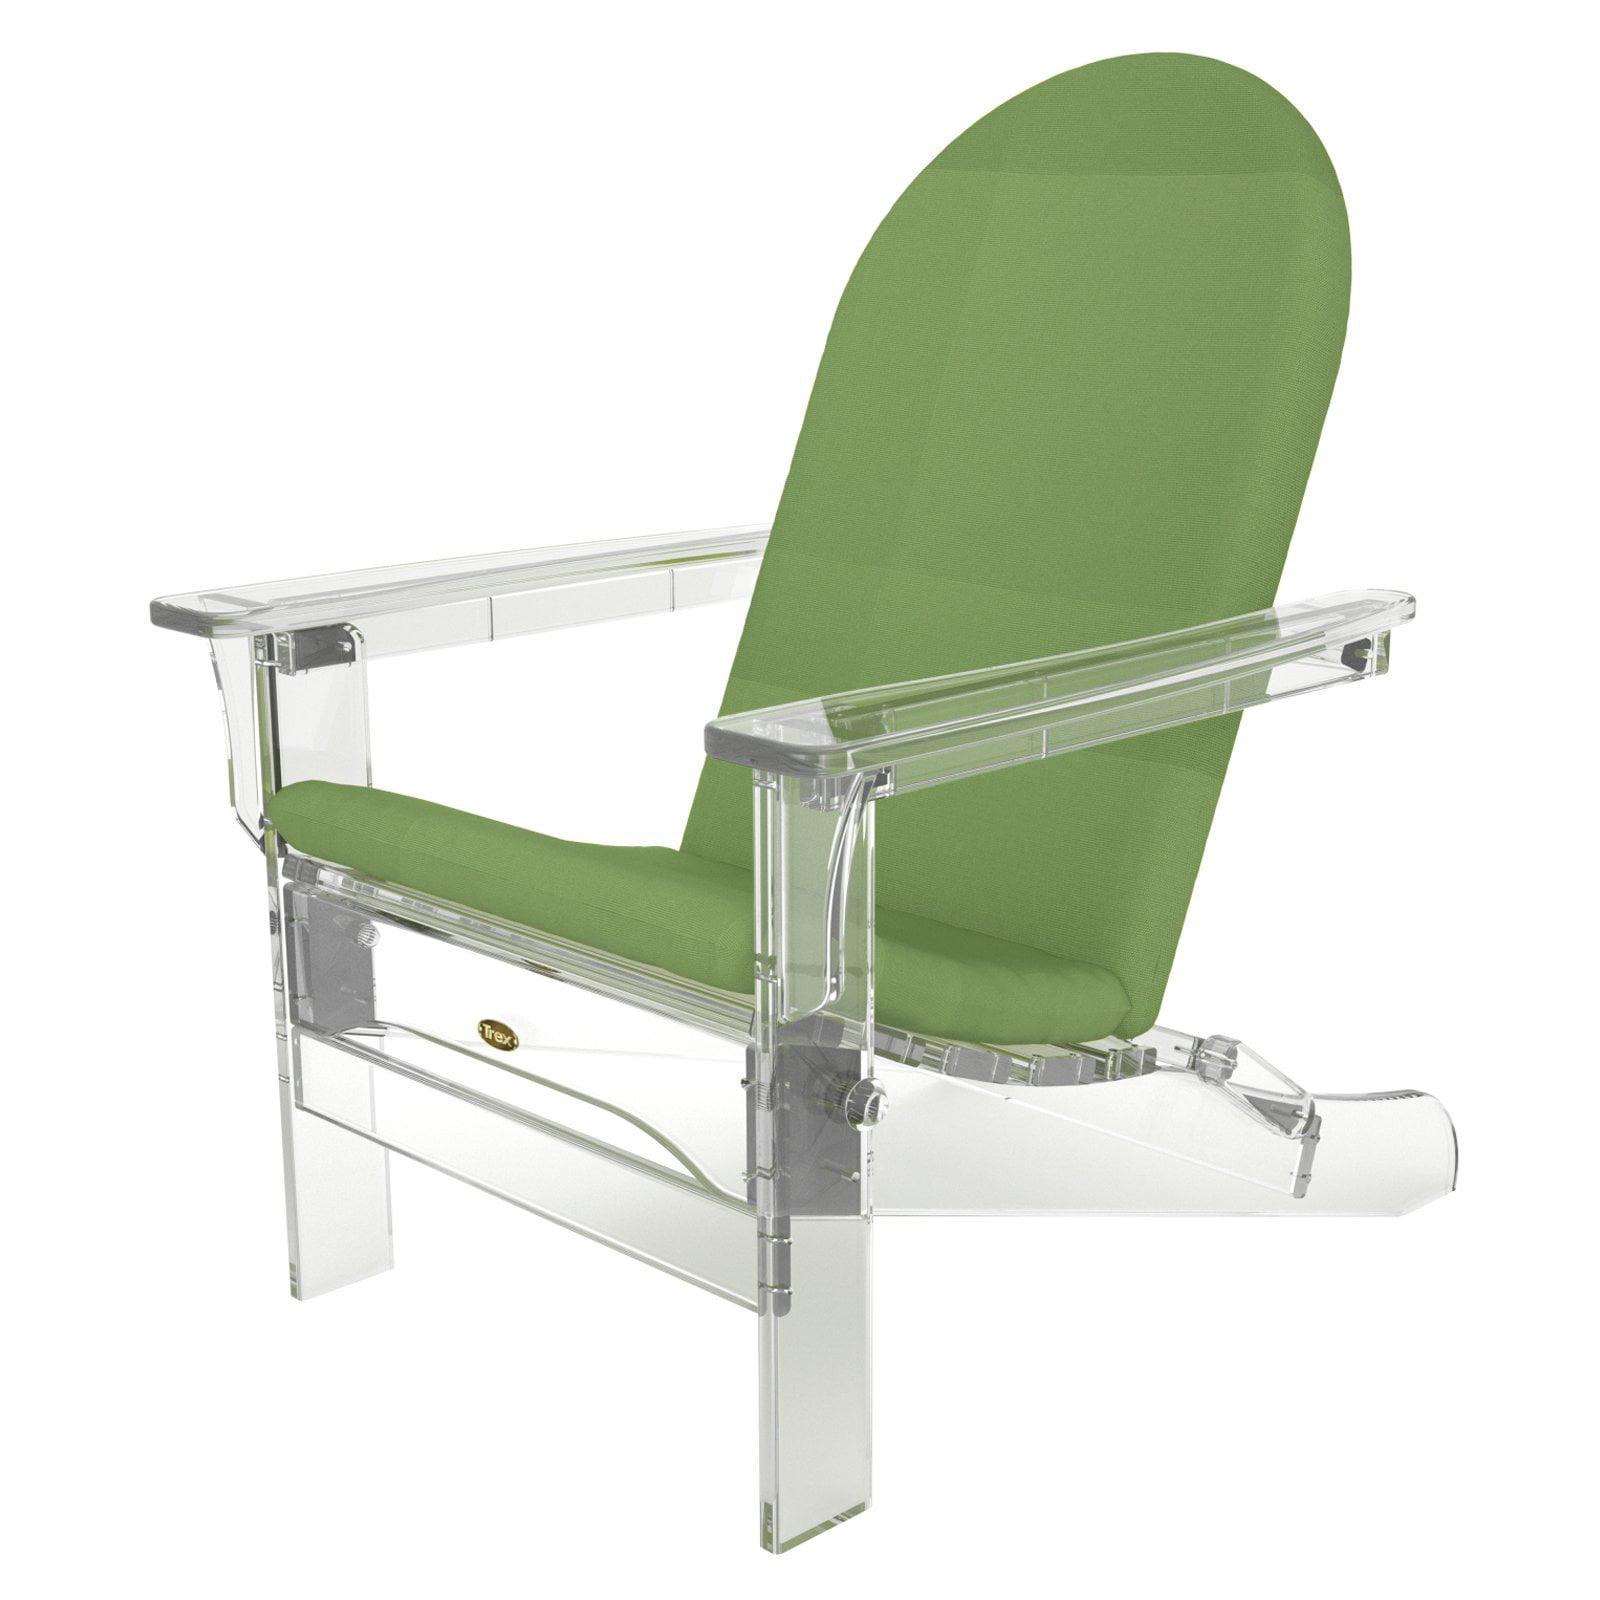 Trex Outdoor Furniture 46 in. Full Cushion